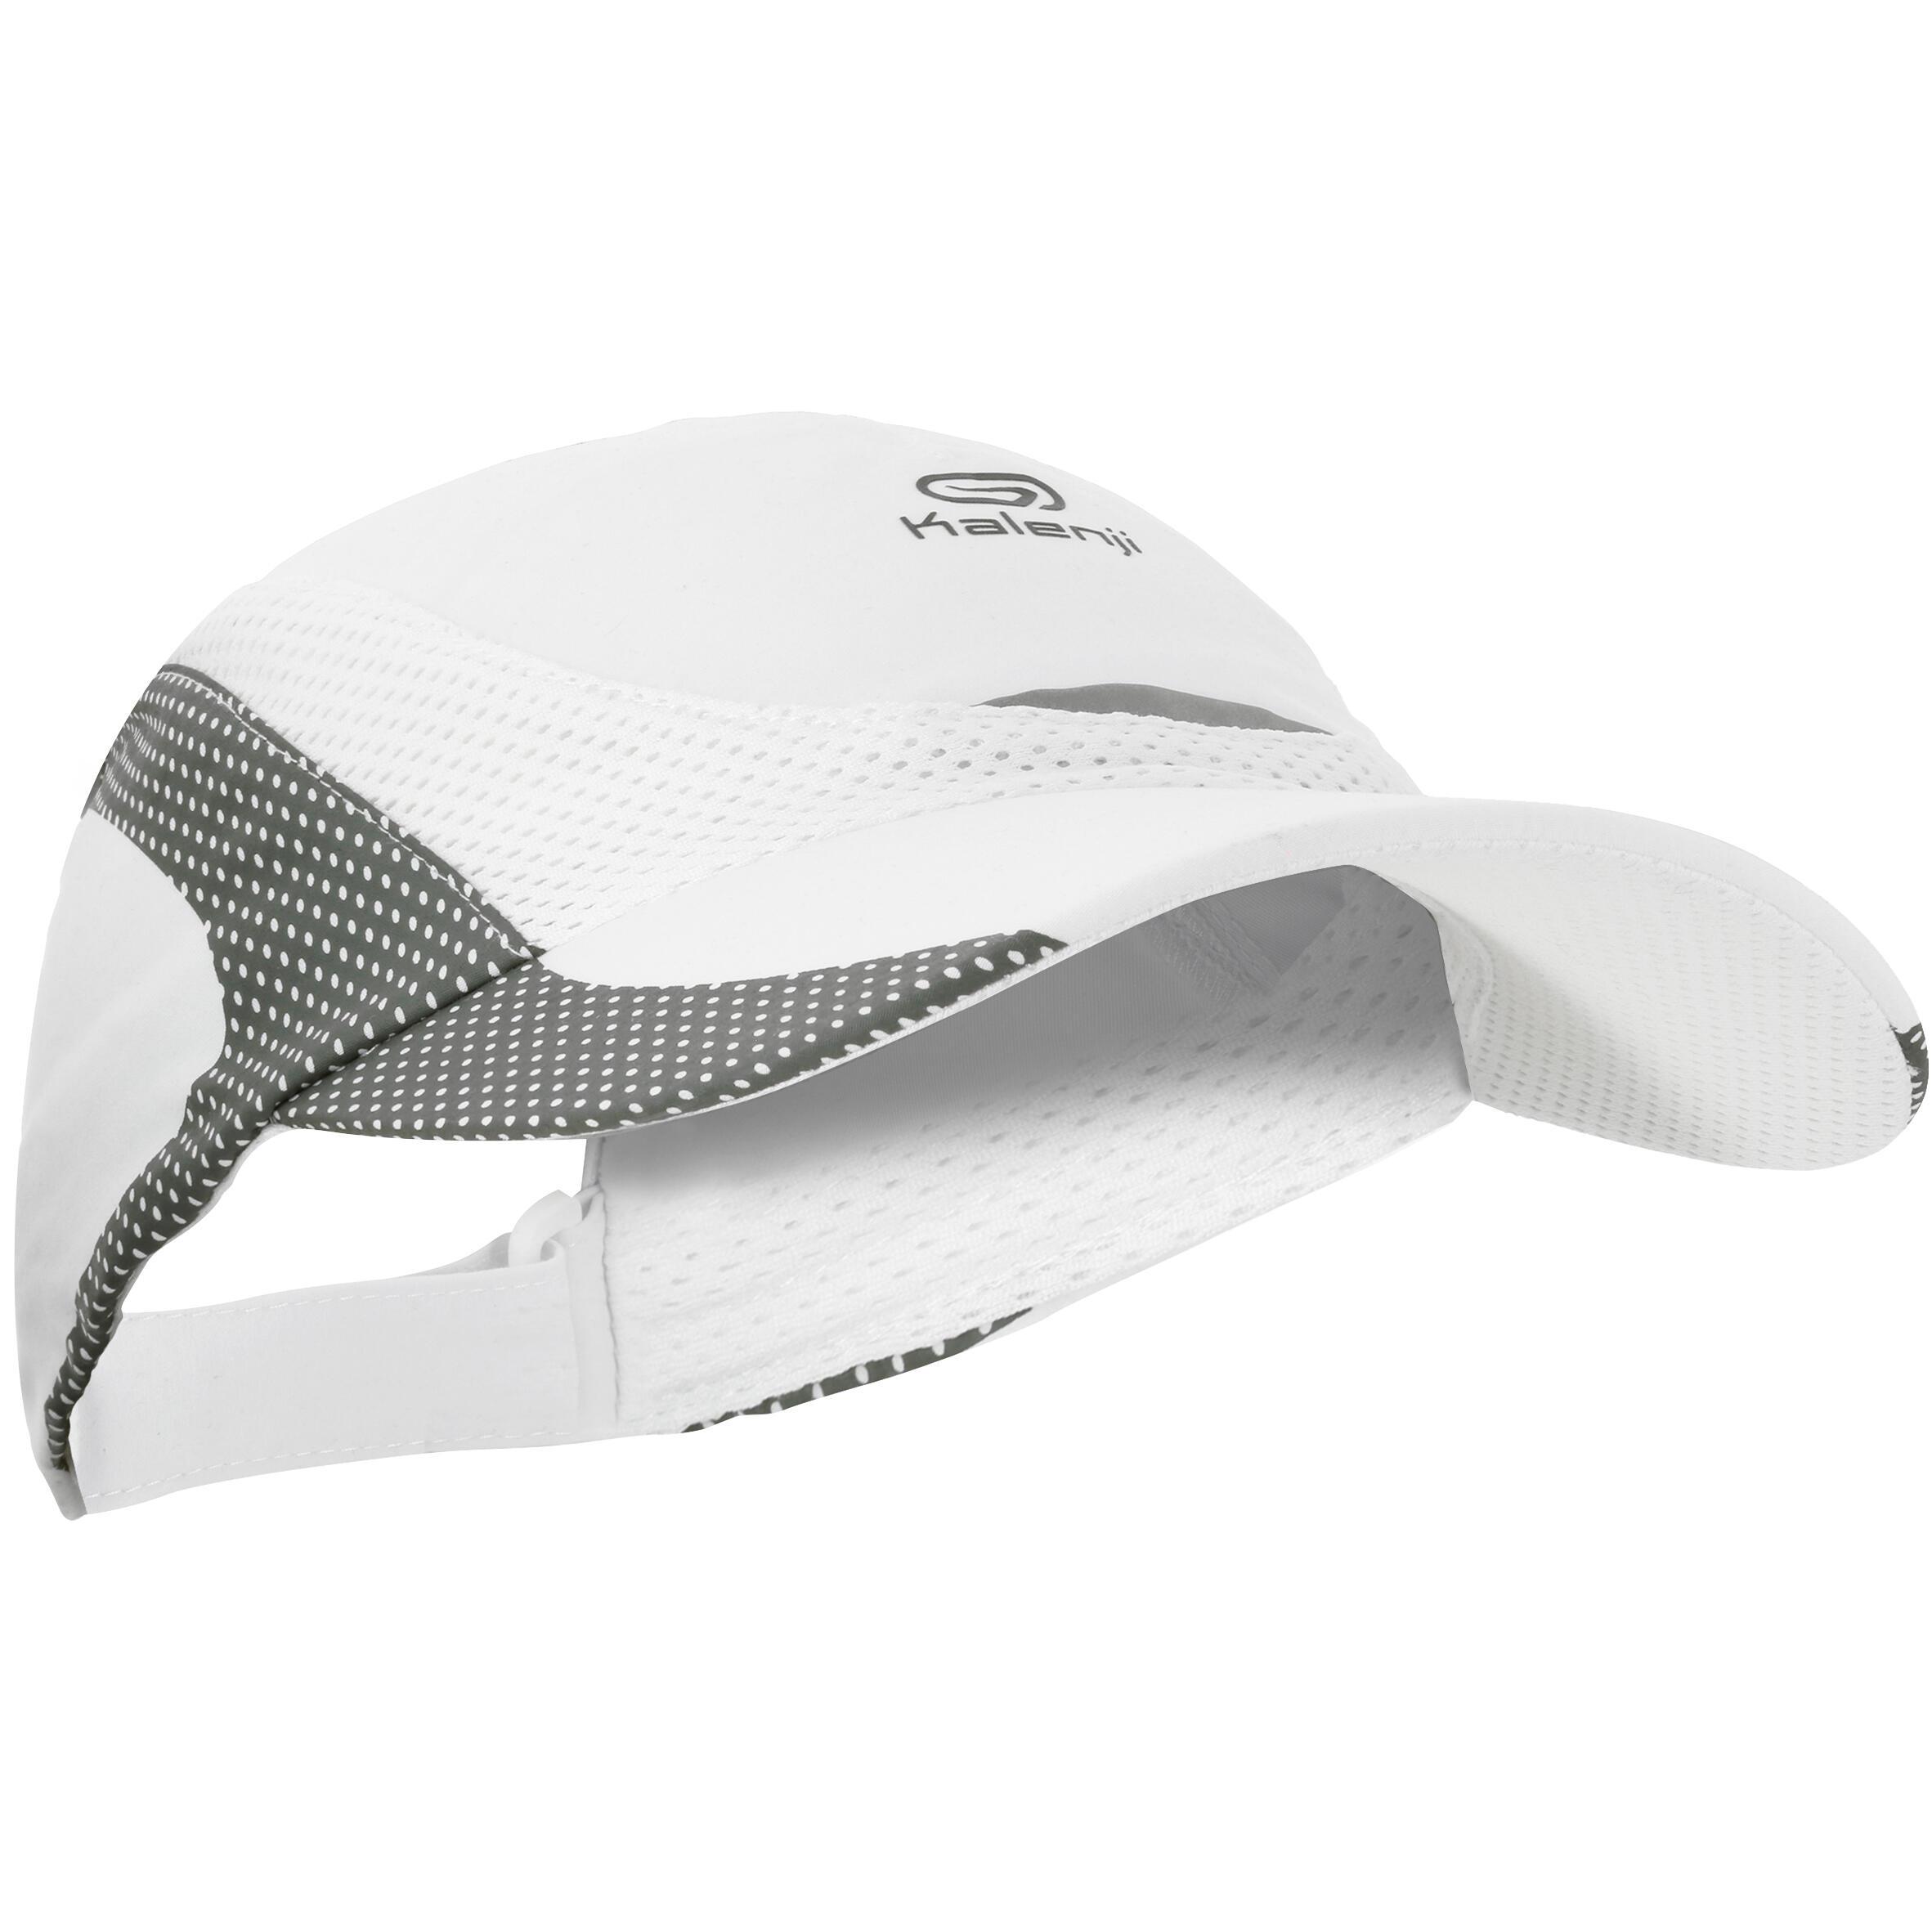 0ea14c2d7ce Pet of hoed kopen?   Decathlon.nl